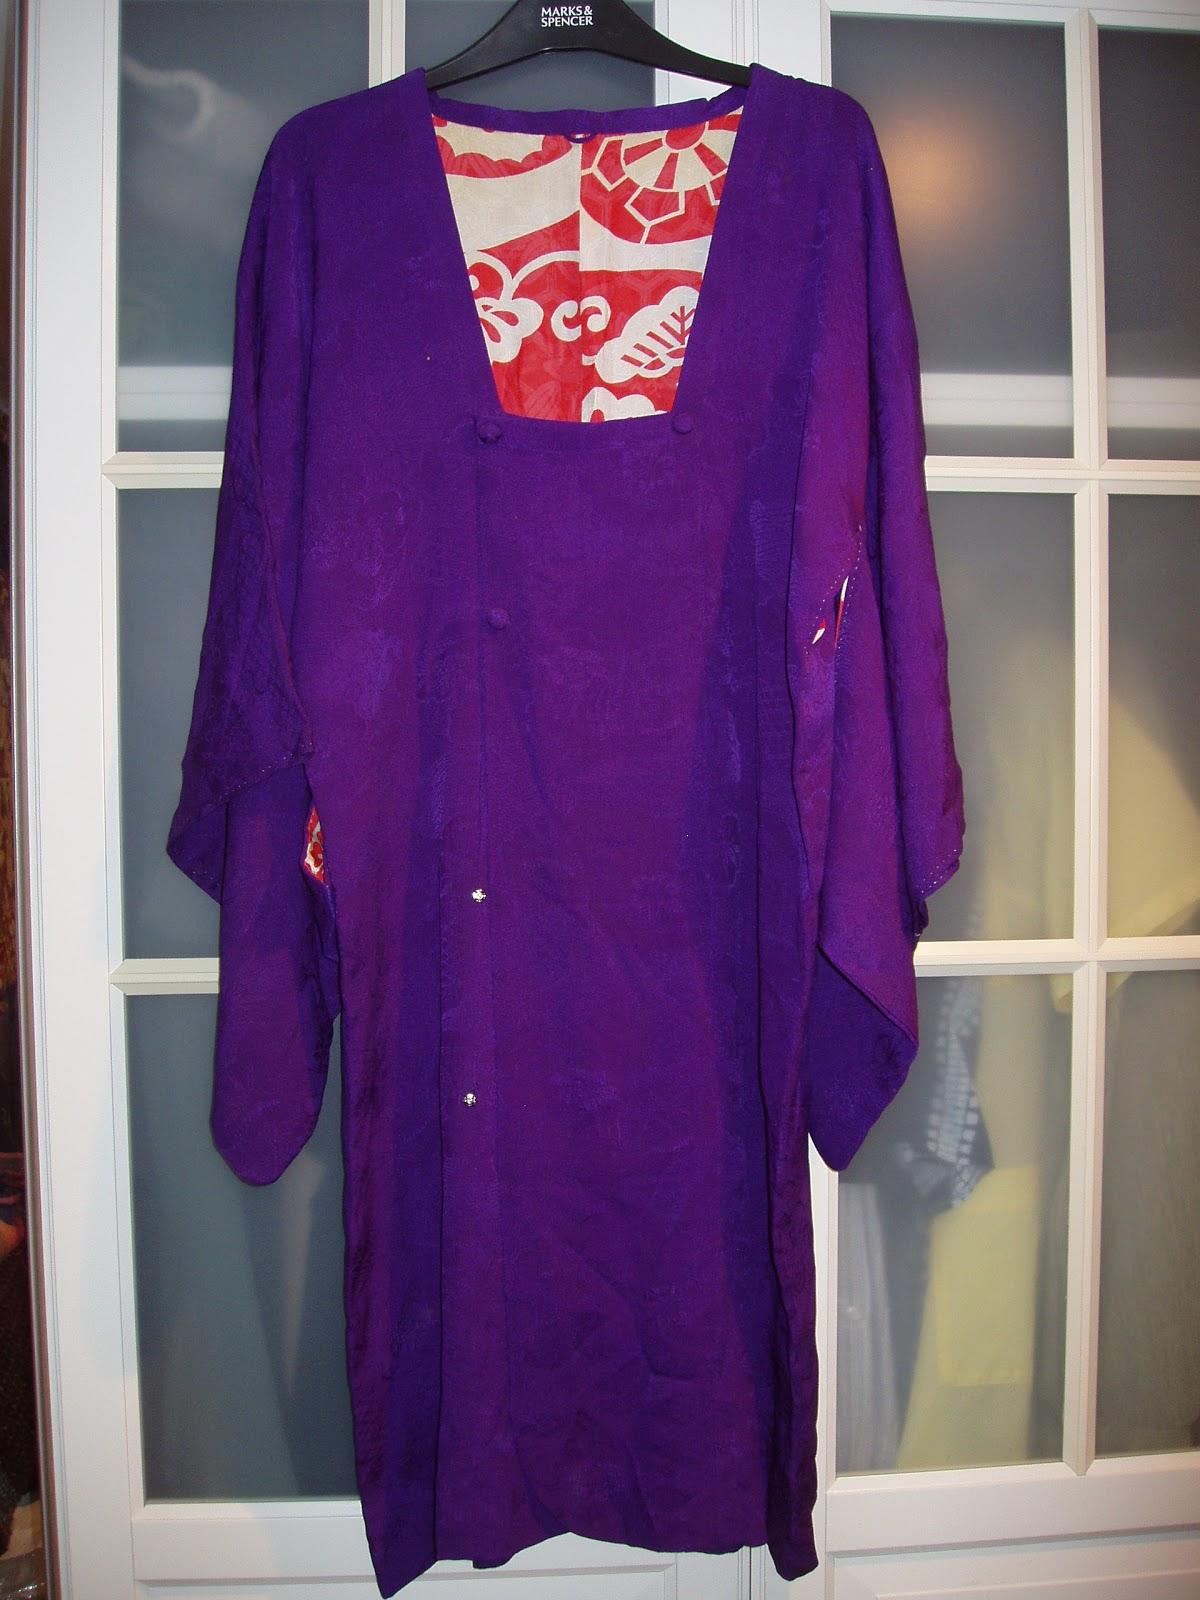 sashiko and other stitching: Silk washing and anatomy of a michiyuki ...